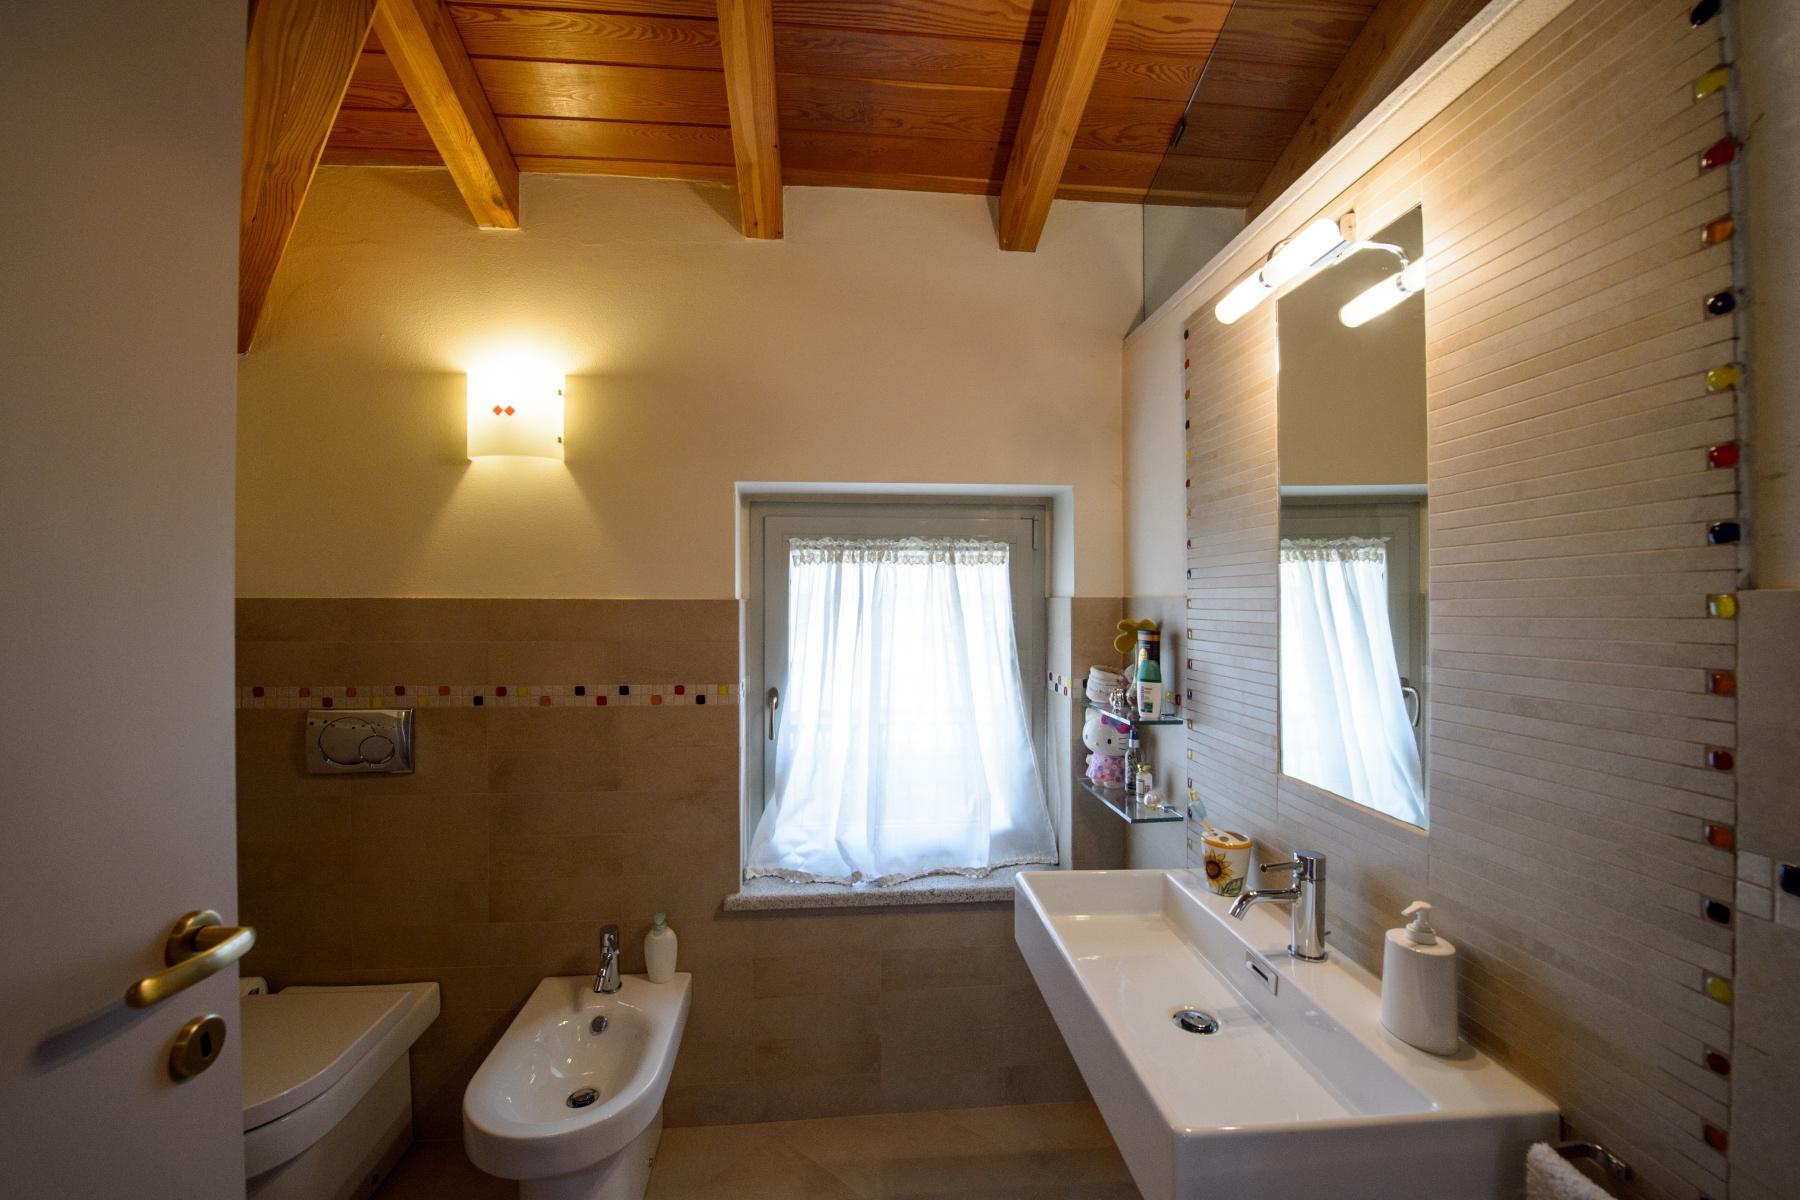 Casa indipendente in Vendita a Agrate Conturbia: 5 locali, 400 mq - Foto 17